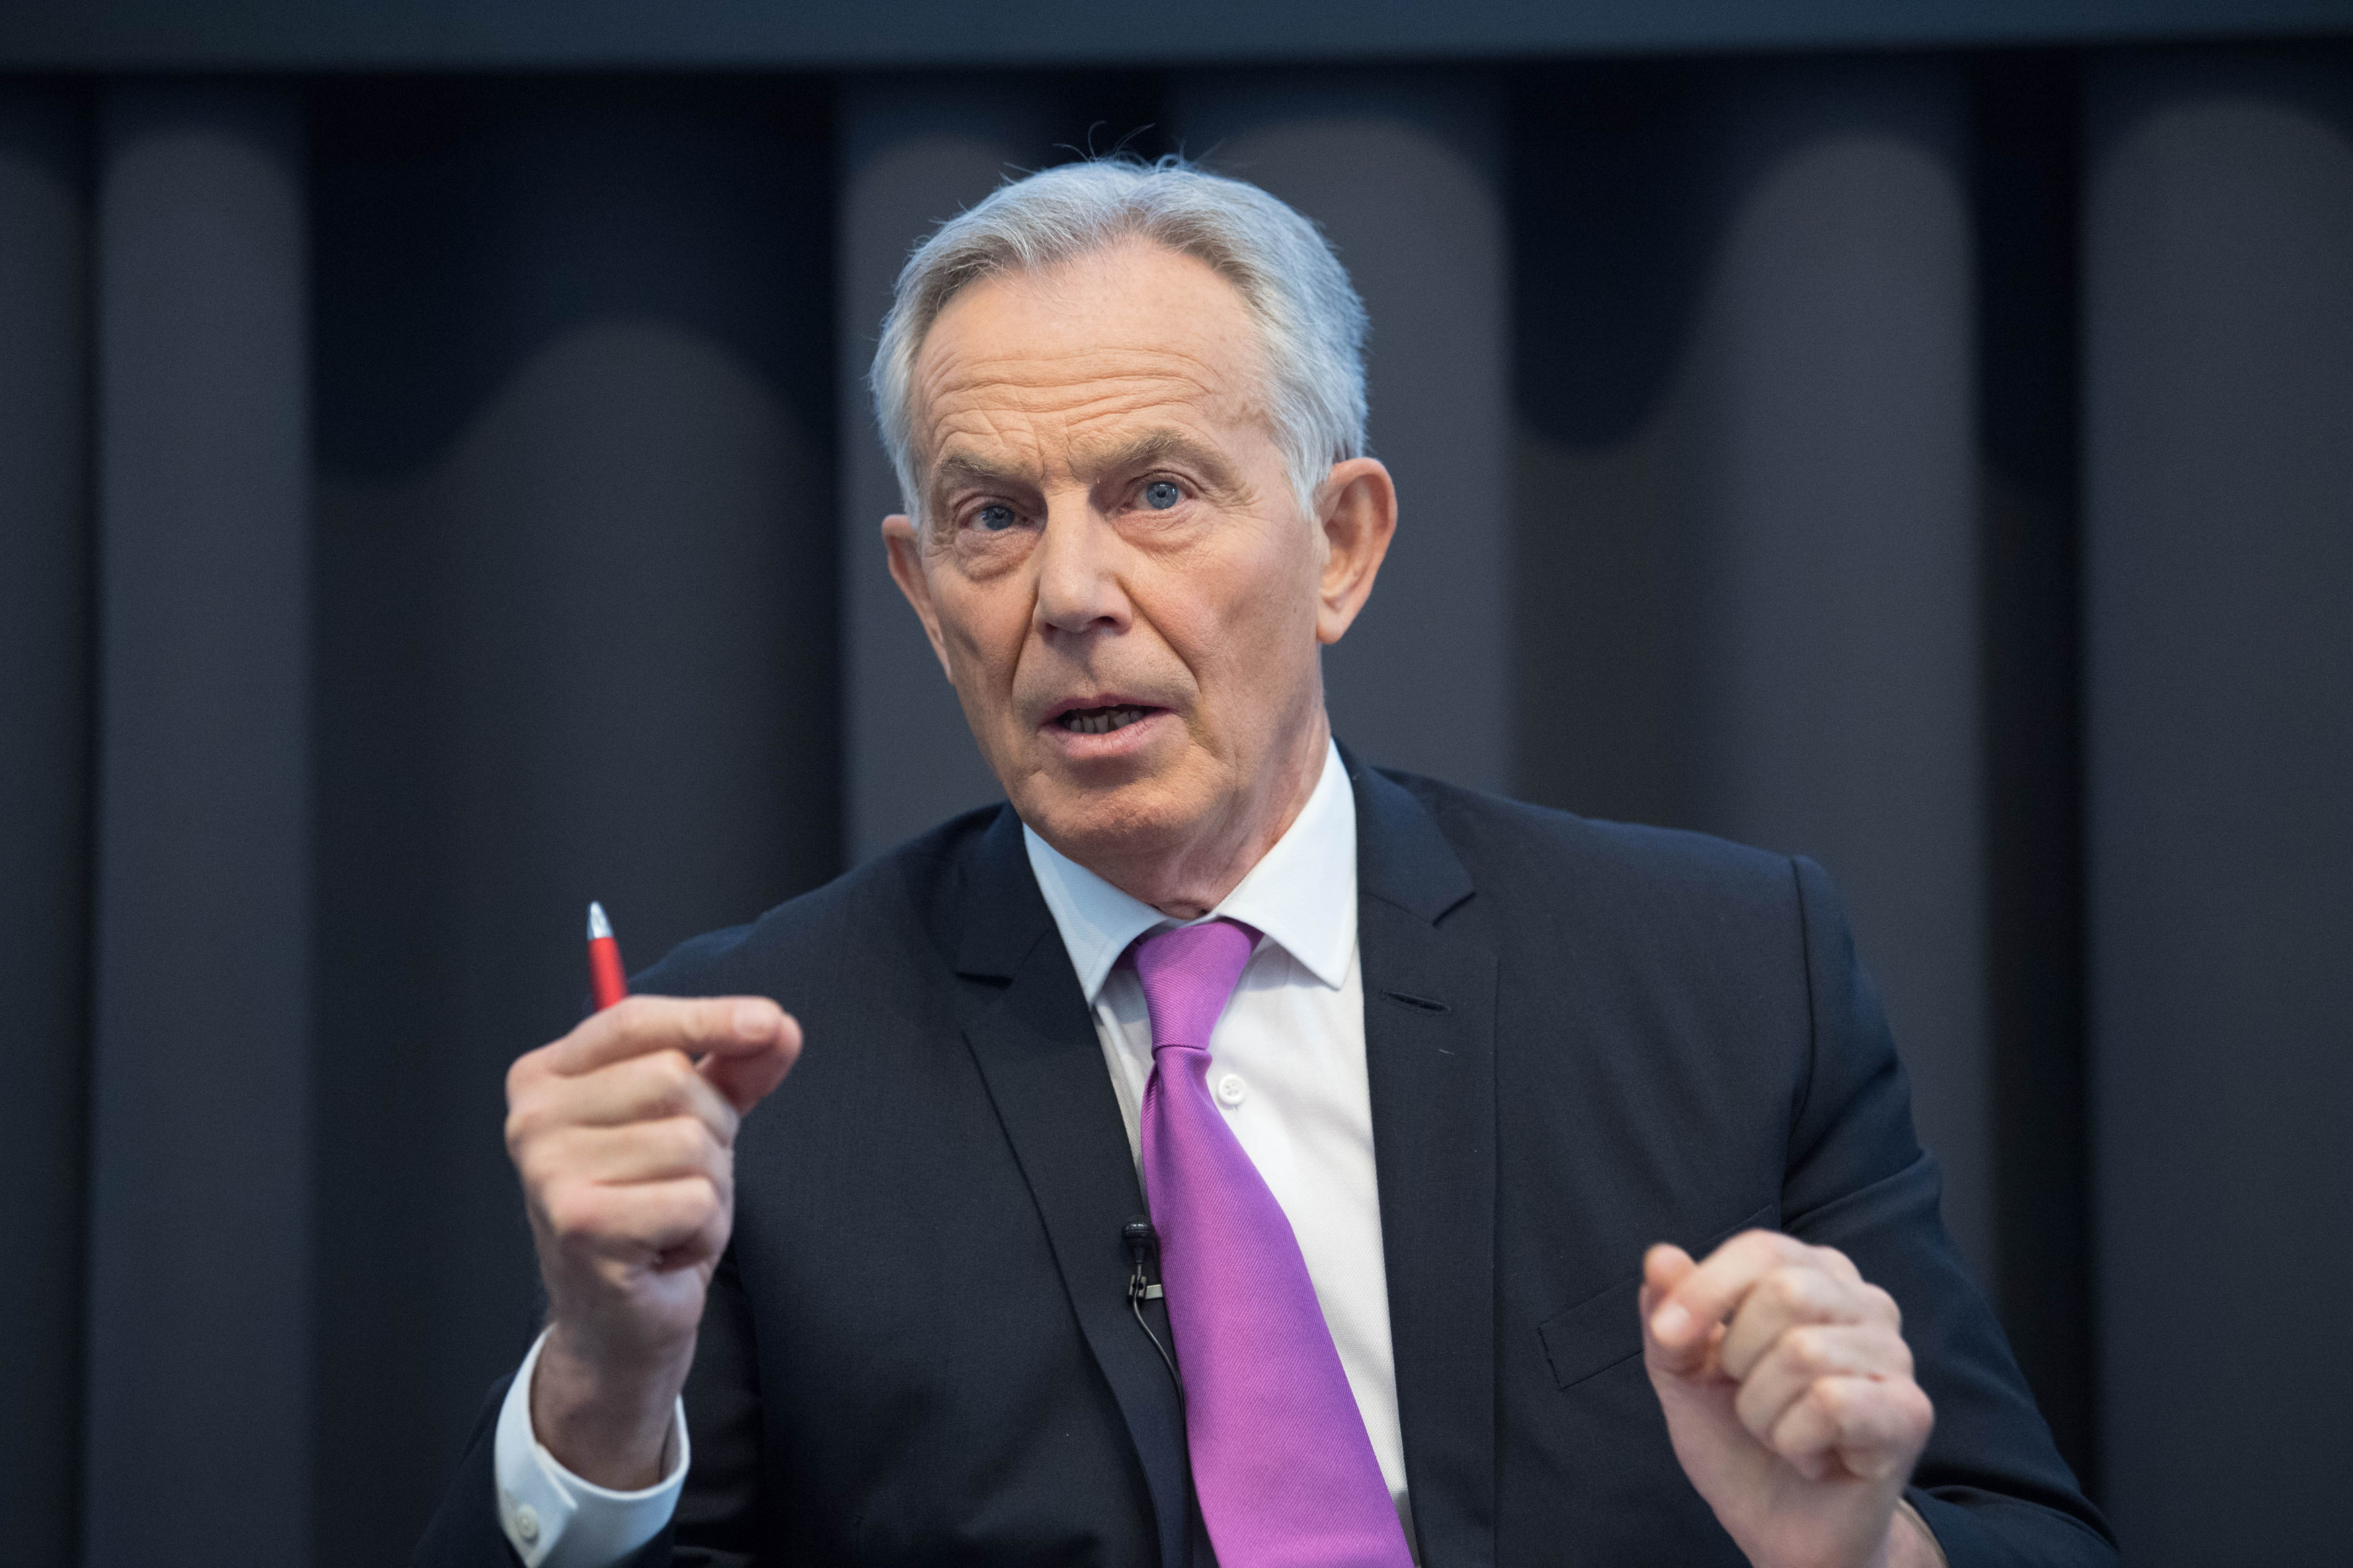 Tony Blair denies breaking coronavirus quarantine by going to restaurant after US trip